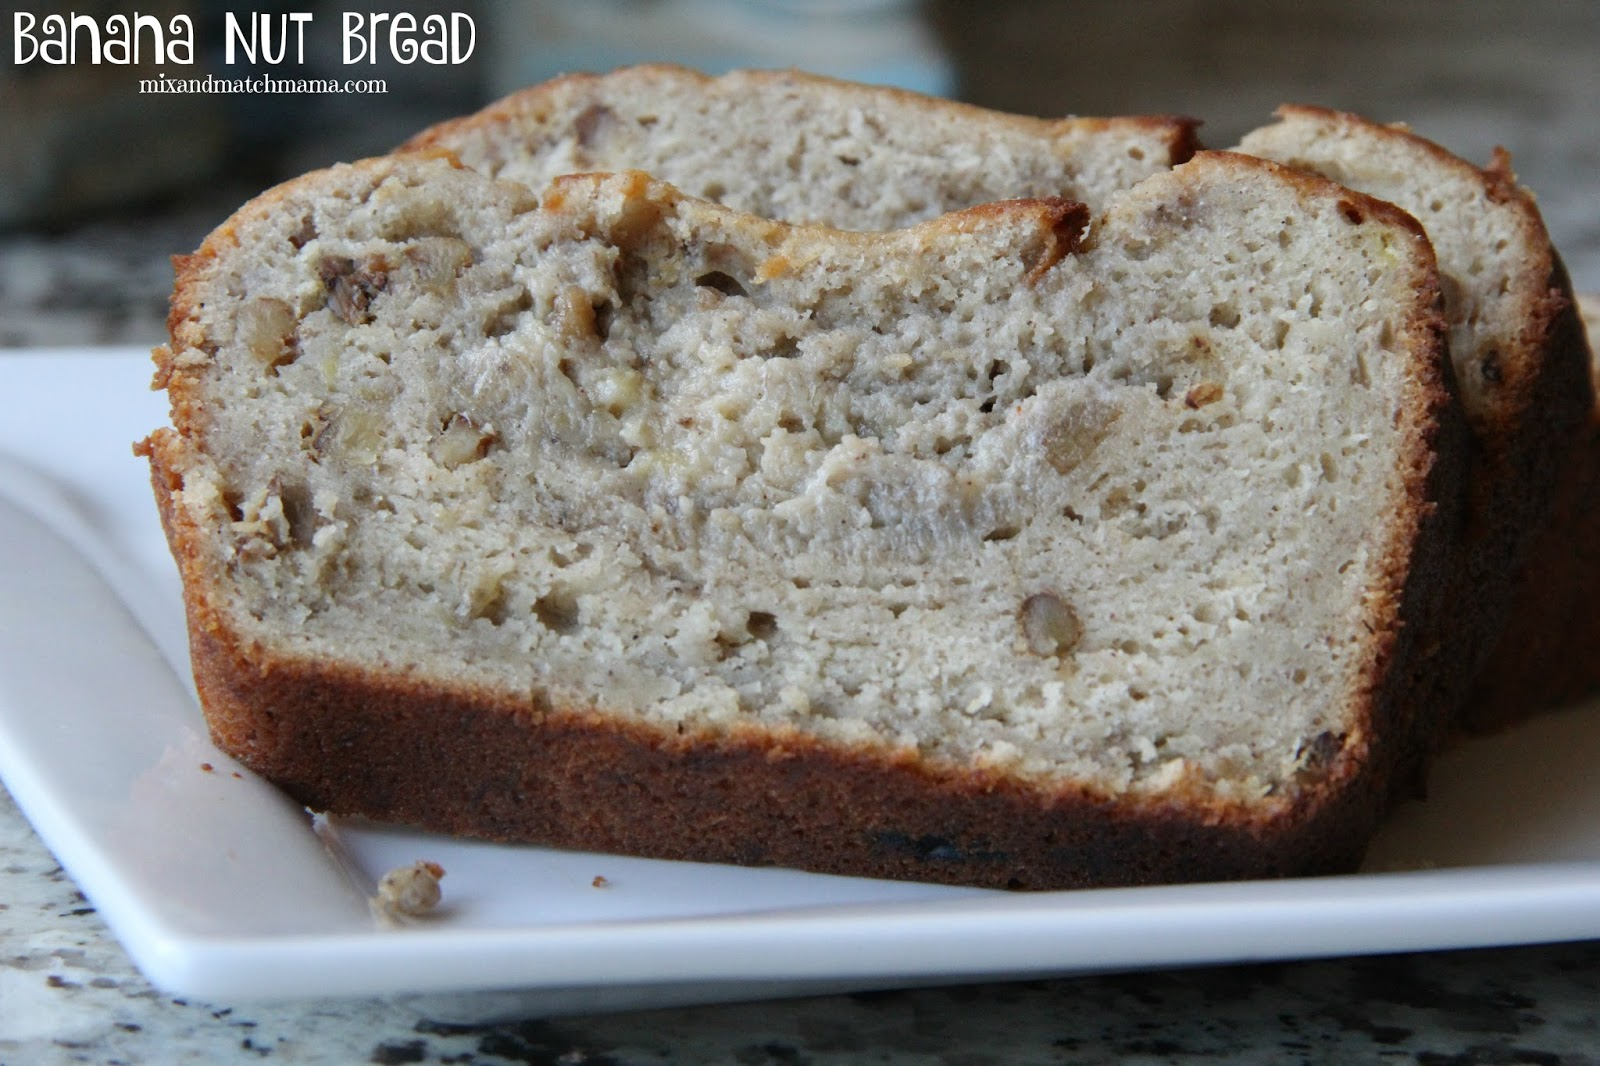 Banana Nut Bread | Mix and Match Mama